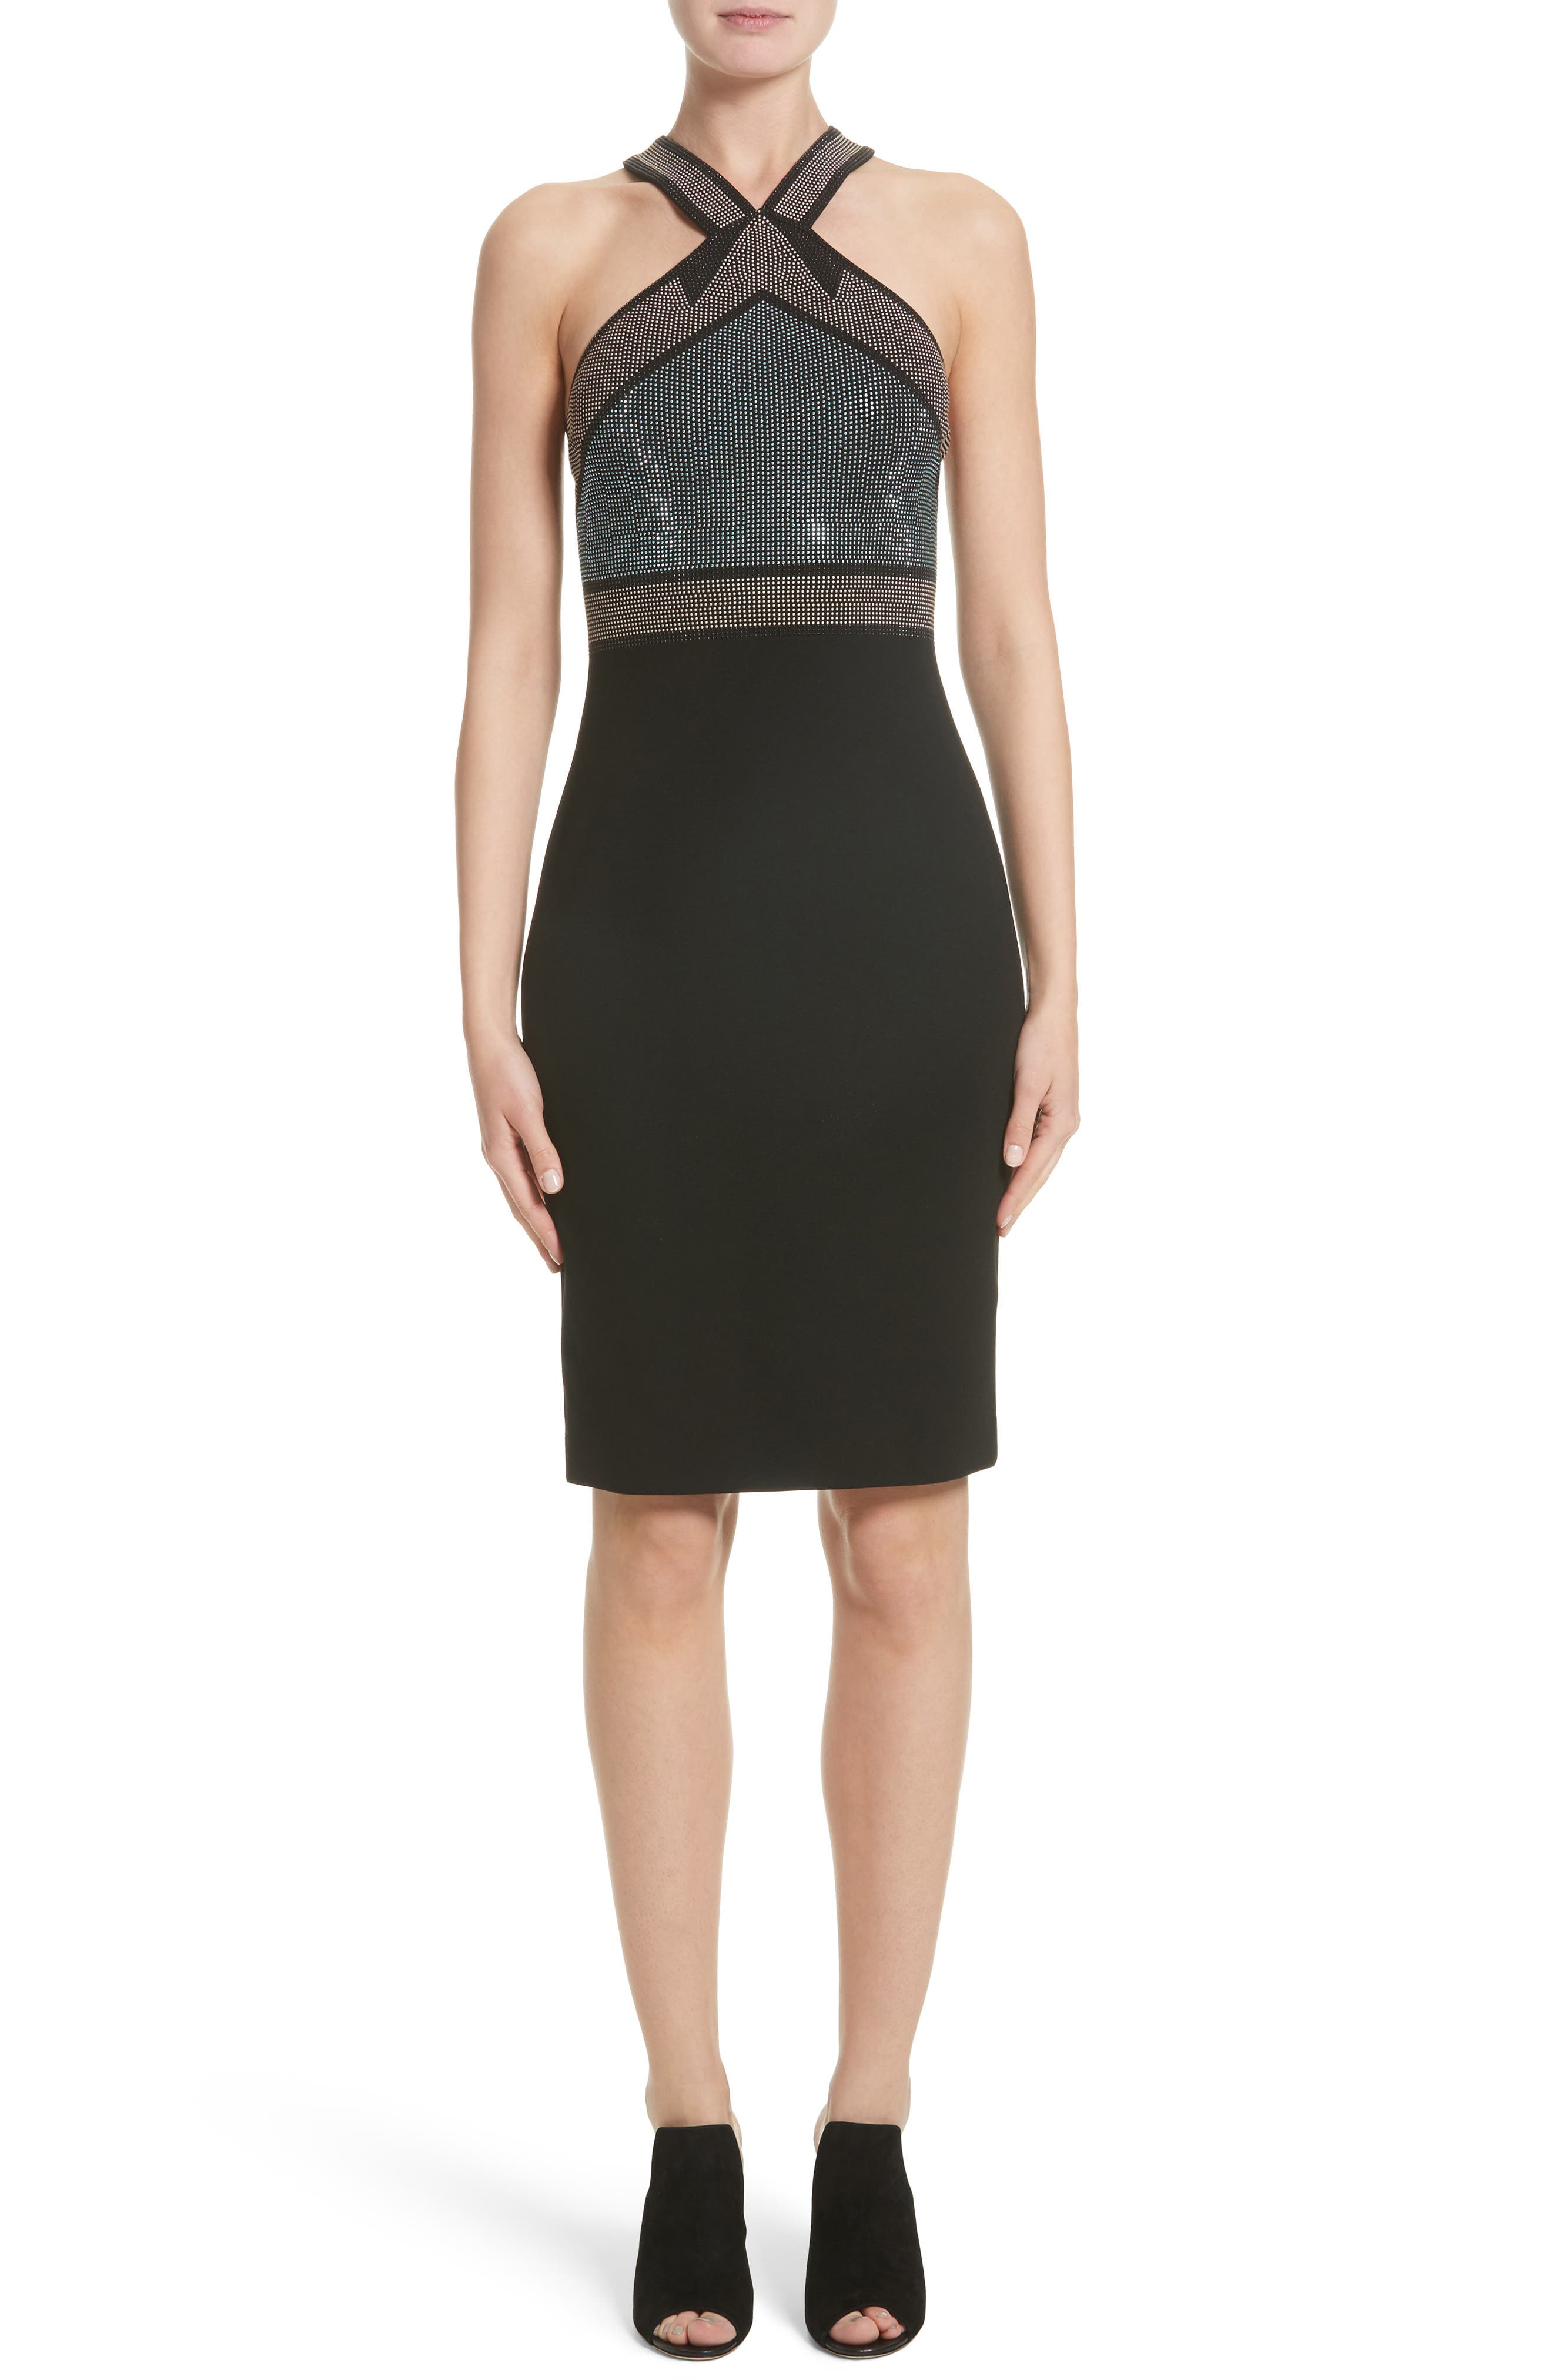 Versace Rhinestone Halter Dress